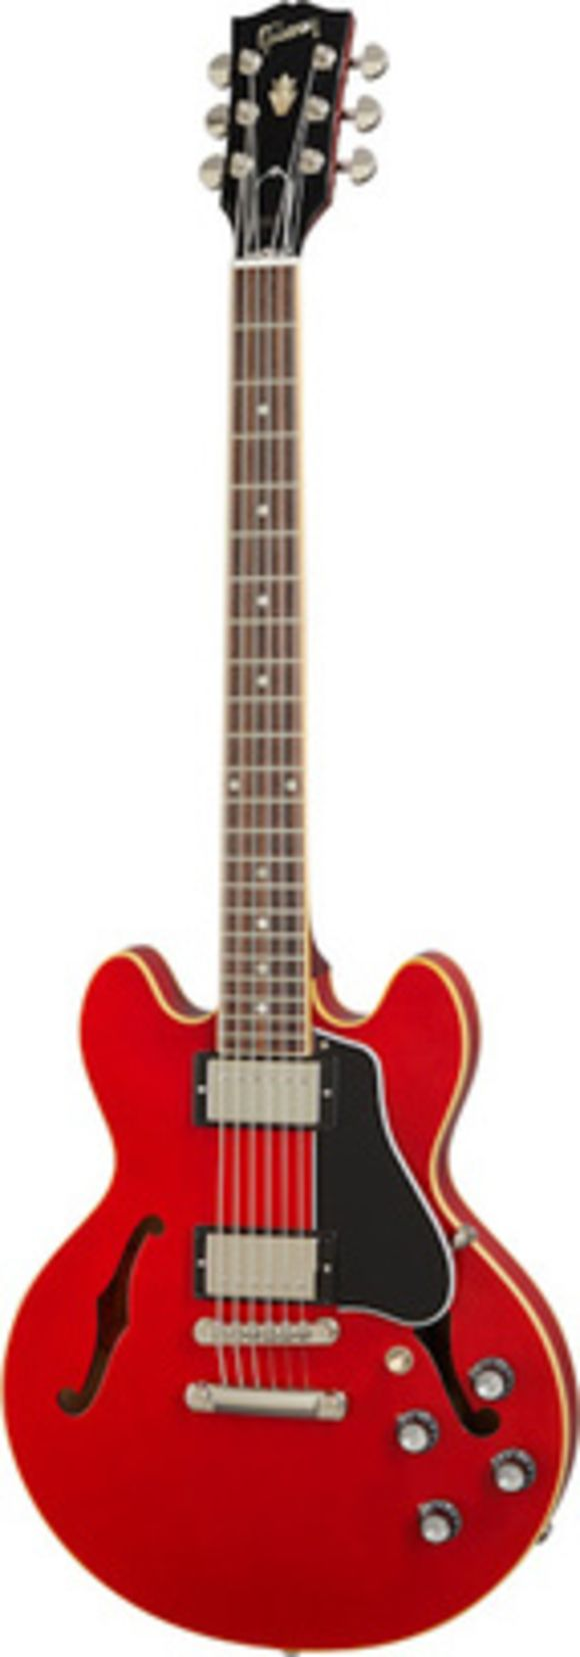 ES-339 60s Cherry Gibson